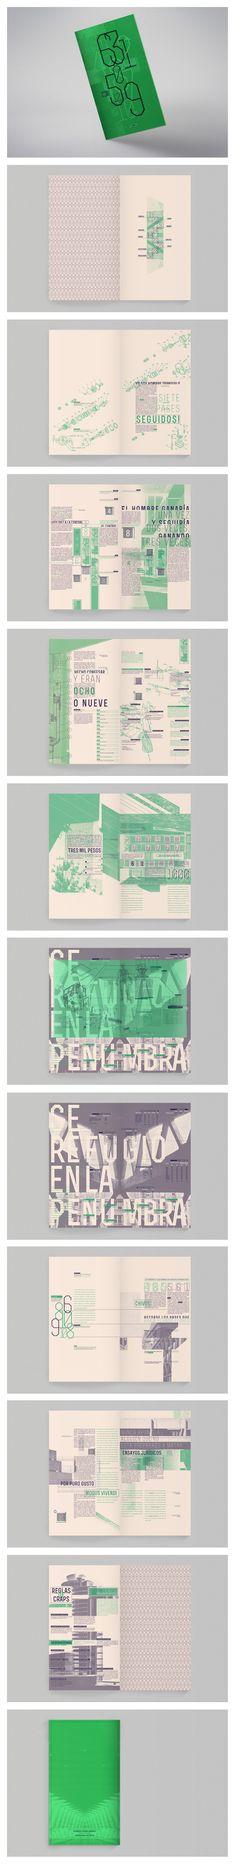 Interior covers pattern// Fede Kanno - Editorial / Cuentos para tahúres - Rodolfo Walsh